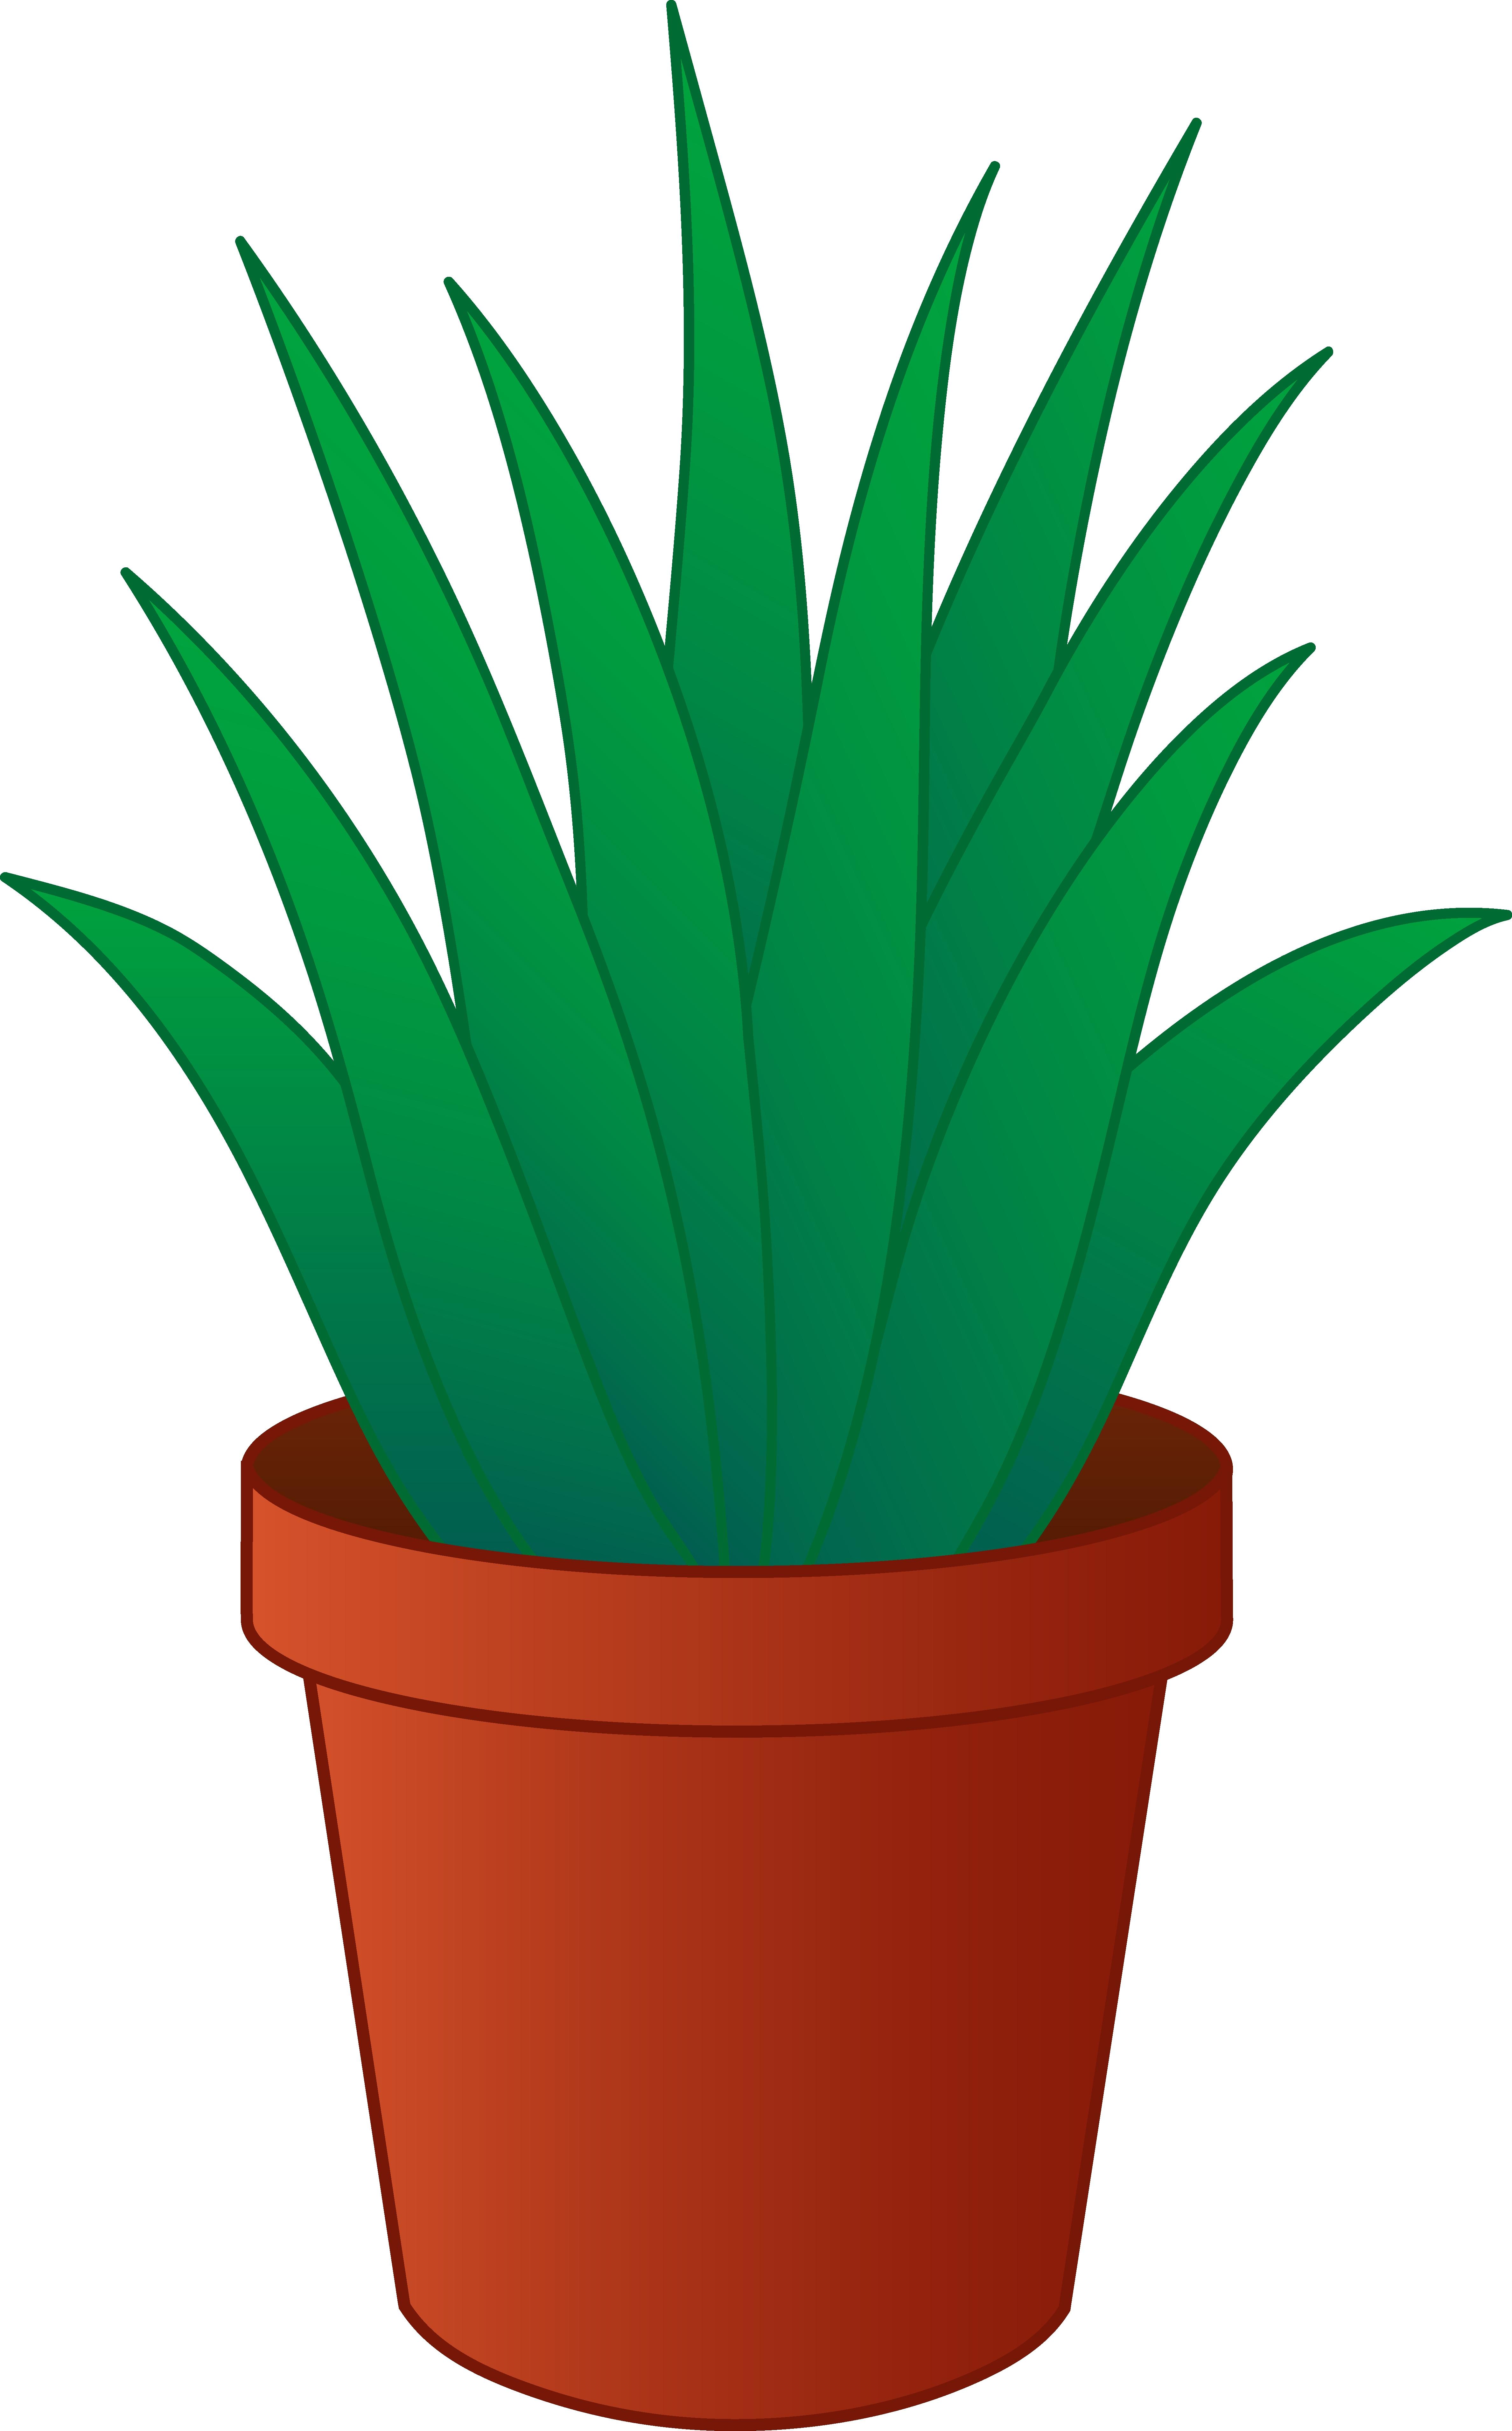 4752x7640 Best Of Plant Clipart Design